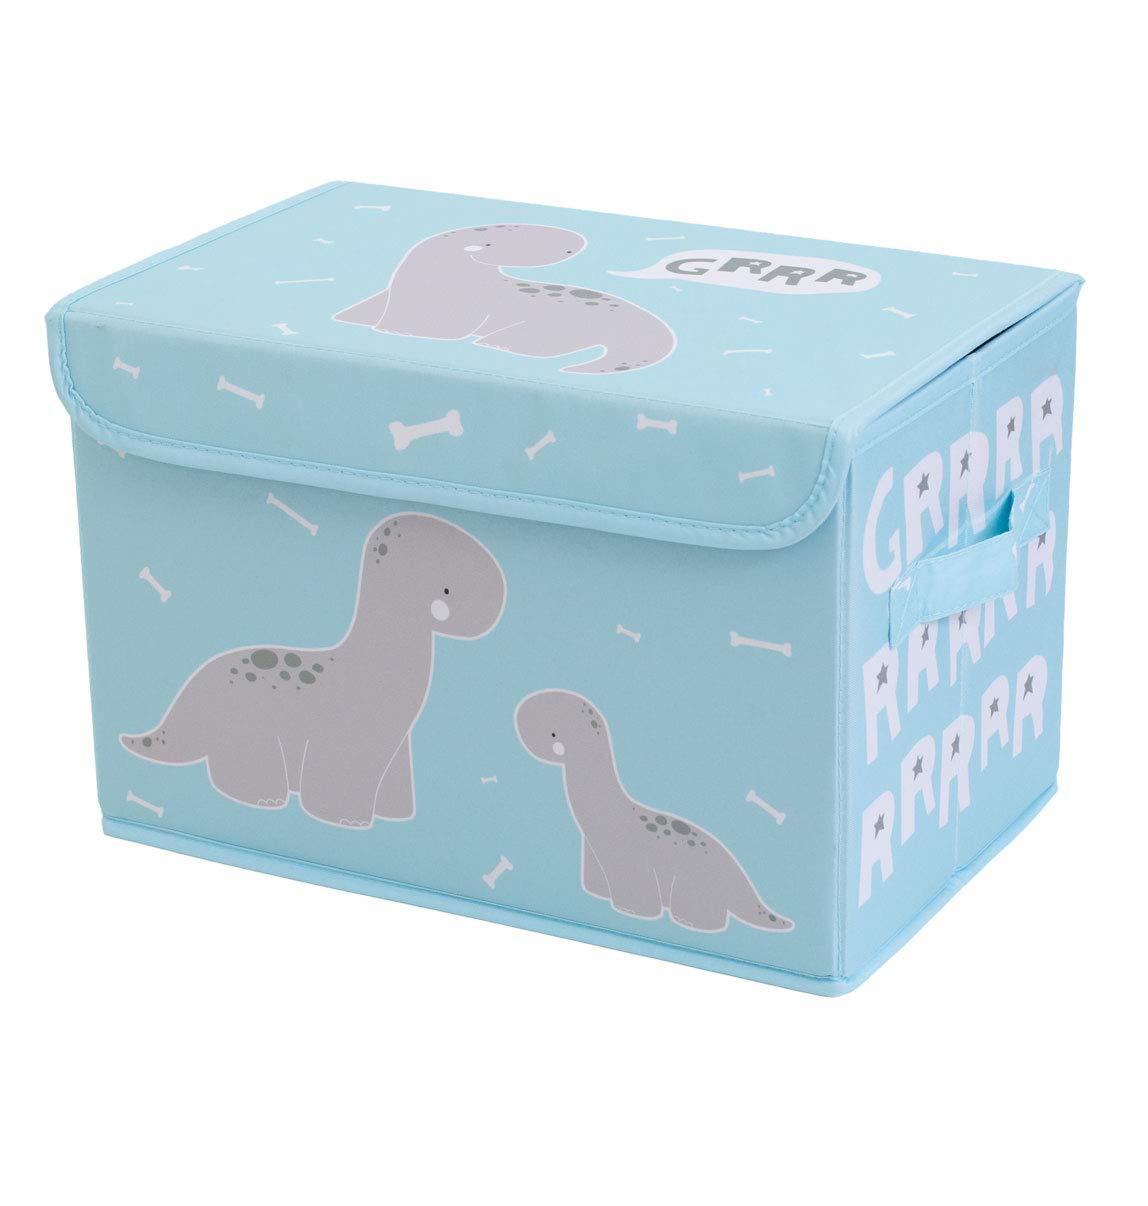 Caja de almacenamiento dise/ño brontosaurus A Little Lovely Company STPUBR02